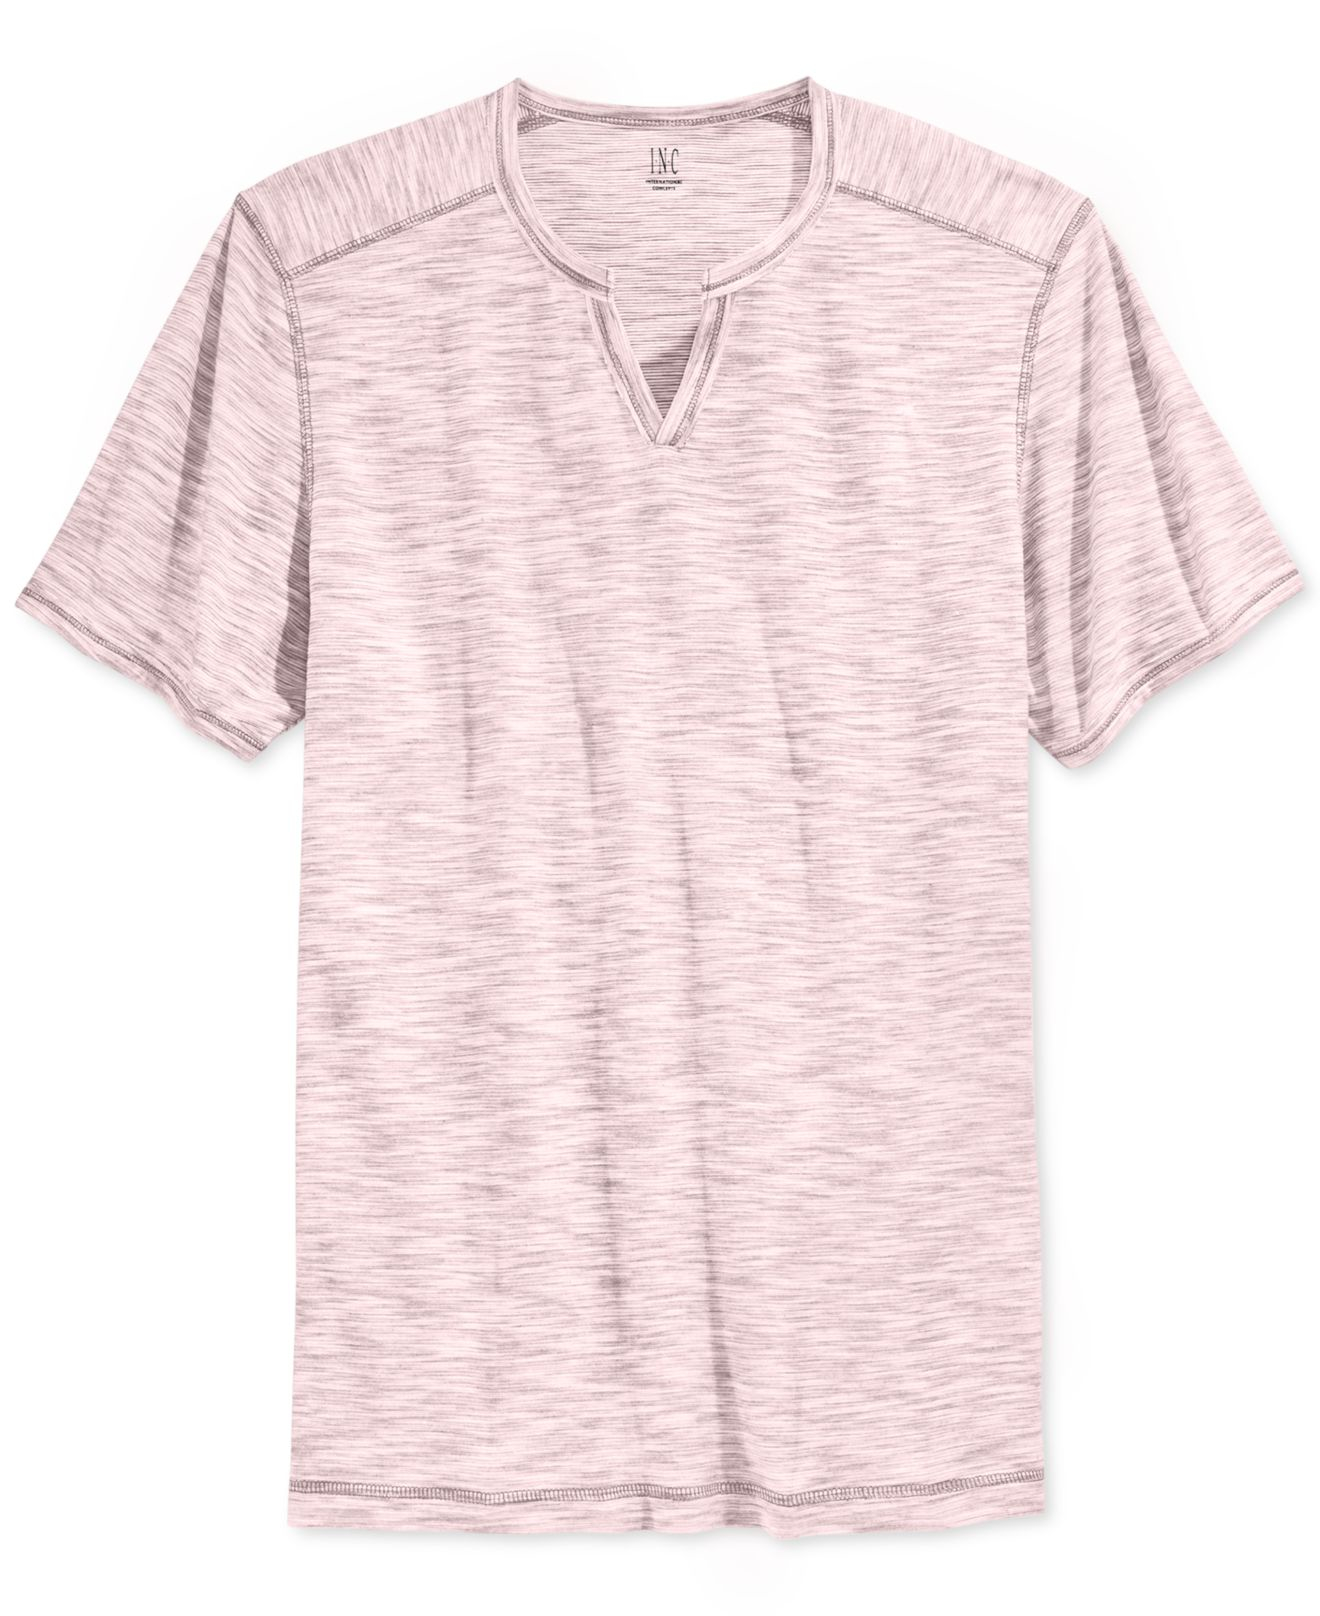 concept clothing company, inc., is a garment mfg. business in malabon,metro manila.